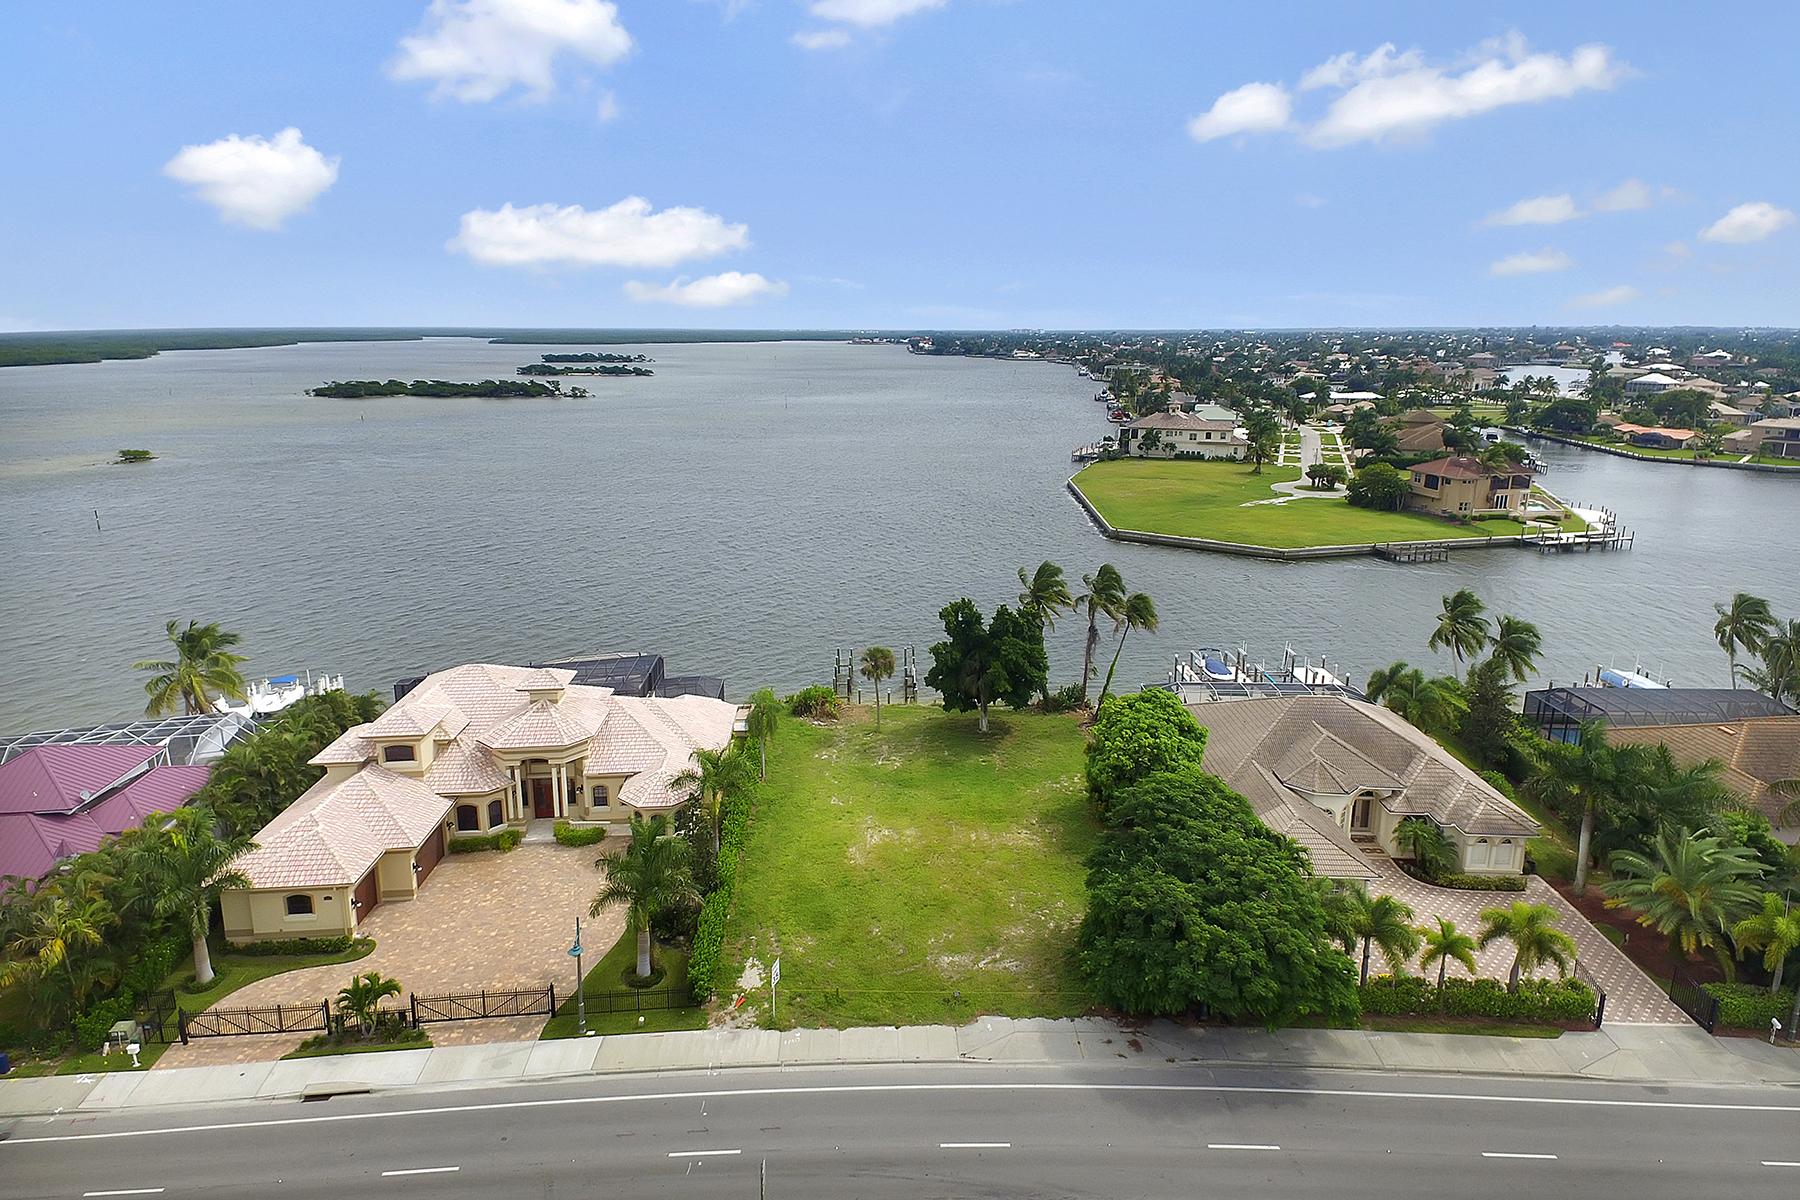 Đất đai vì Bán tại MARCO ISLAND 1389 Collier Blvd Marco Island, Florida, 34145 Hoa Kỳ